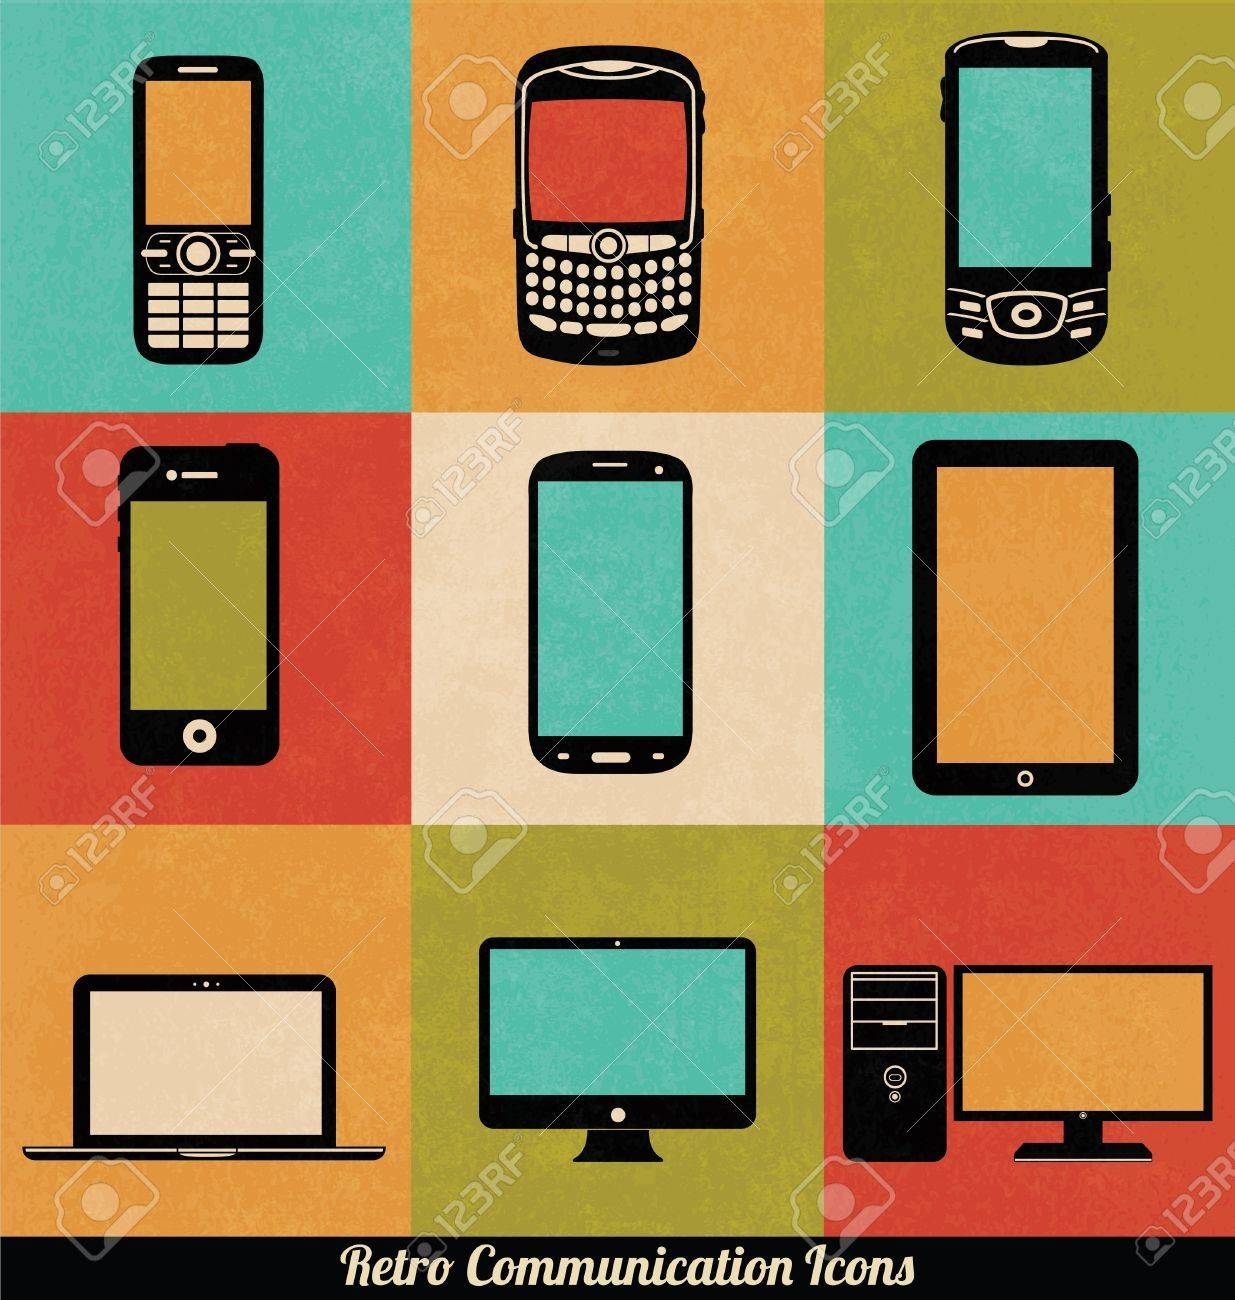 Retro Communication Icons - 15793418